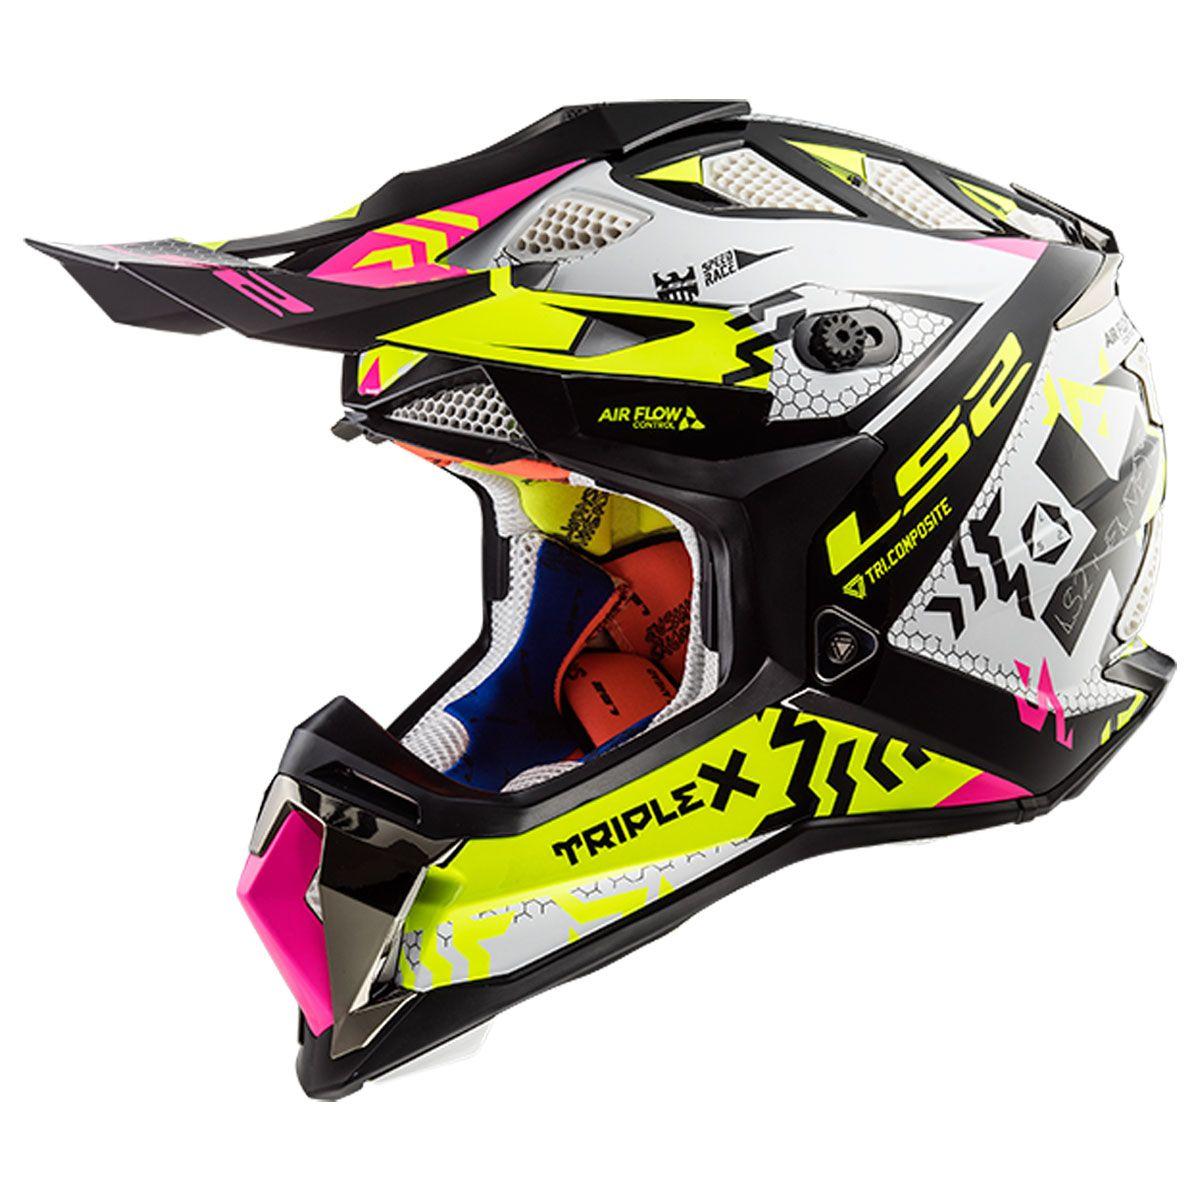 LS2 MX470 Subverter Triplex Black Yellow Pink